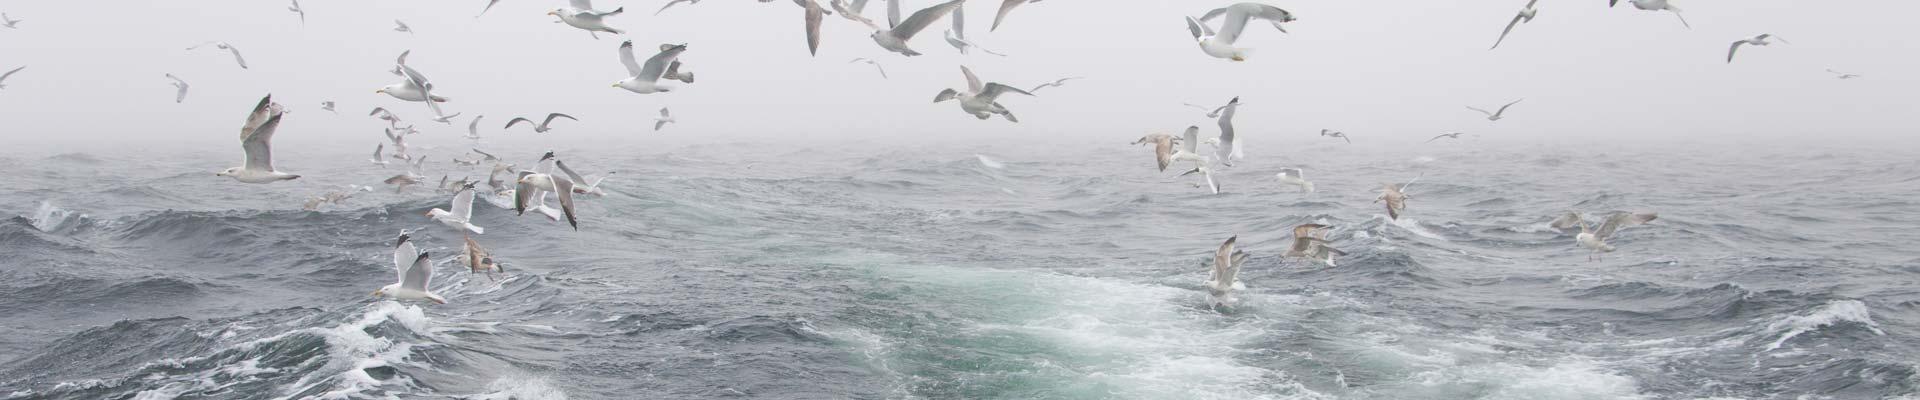 Blog hy line cruises for Cape cod deep sea fishing